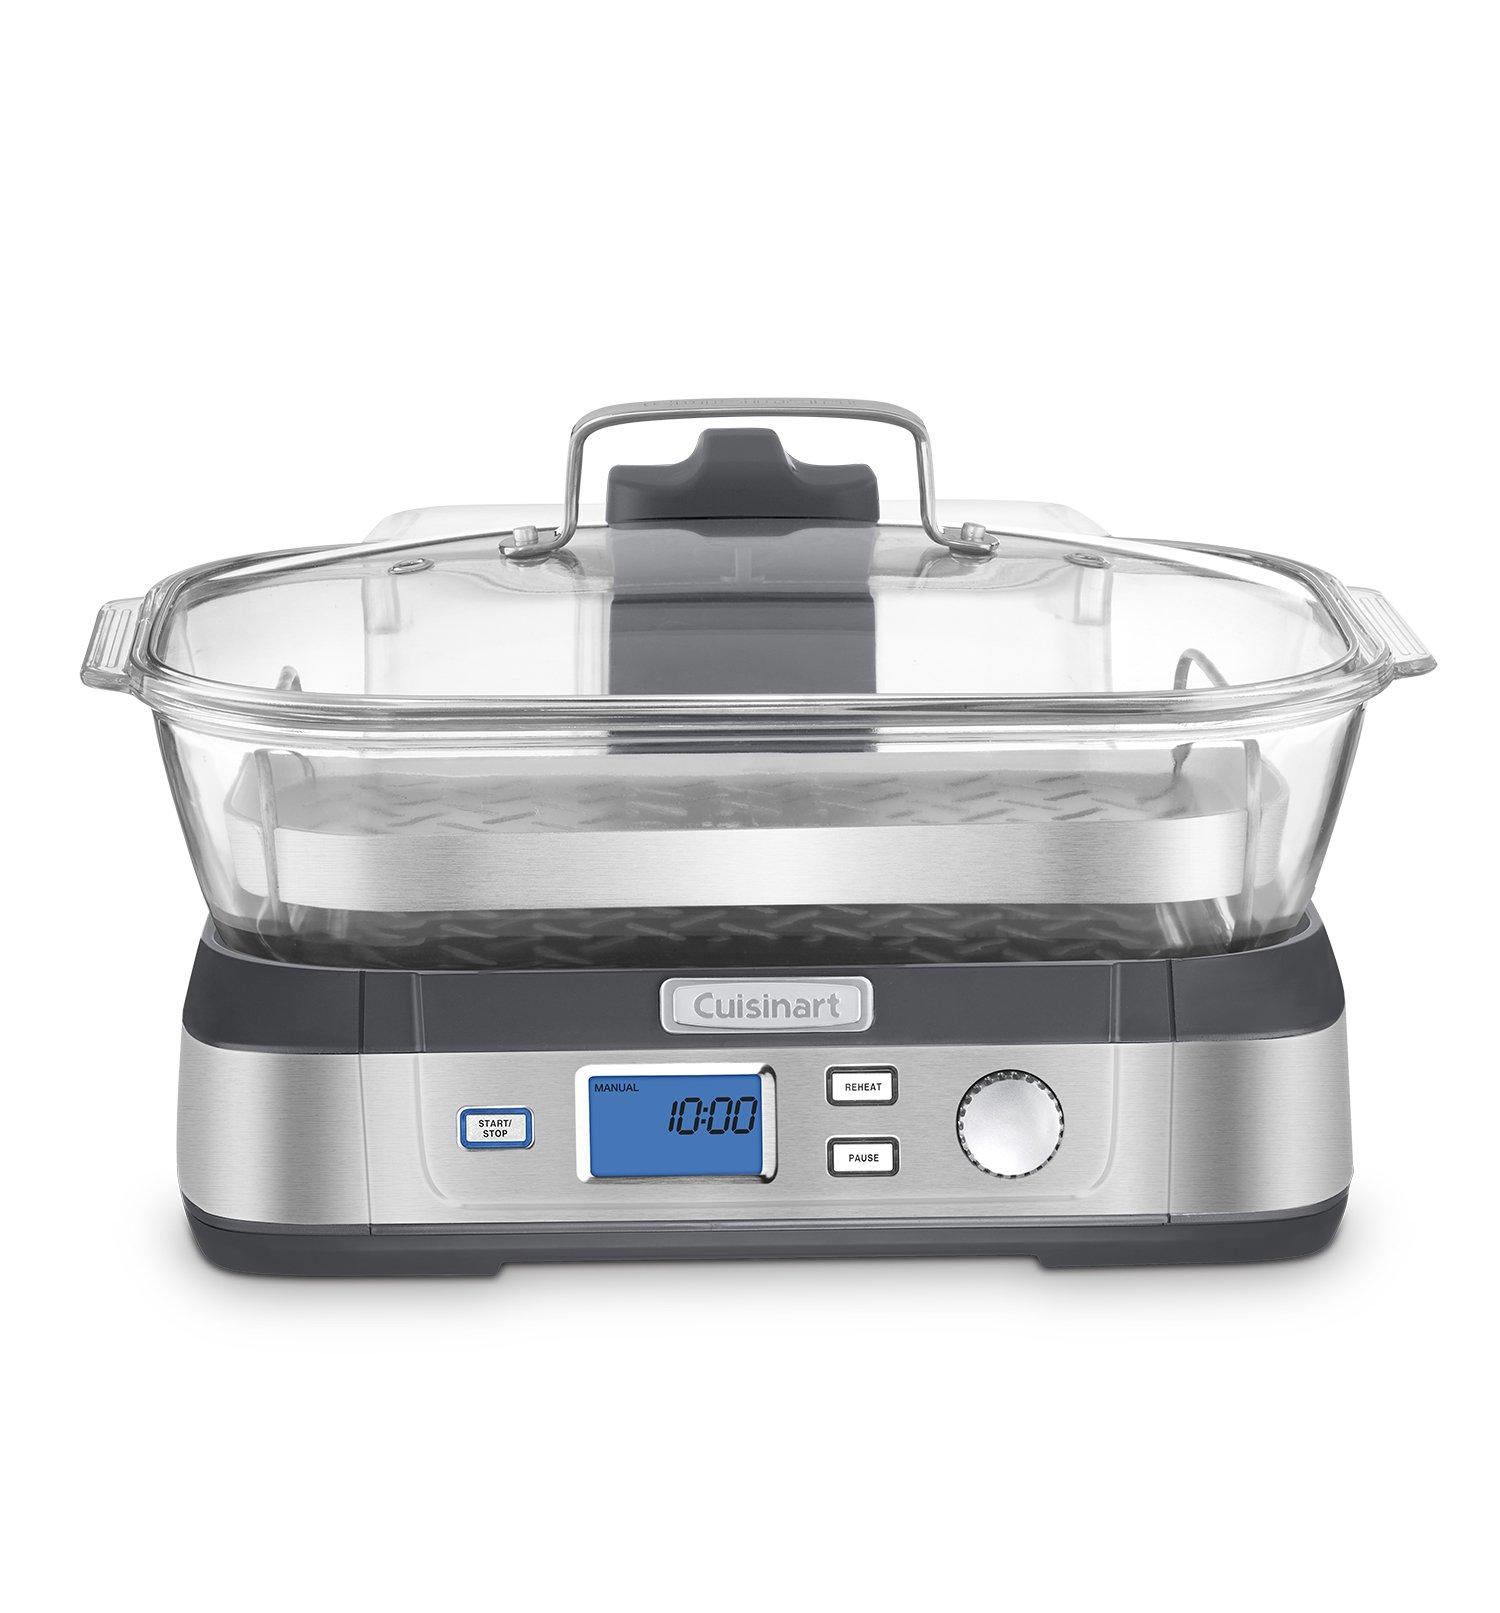 Cuisinart STM-1000 CookFresh Digital Glass Steamer, Stainless Steel by Cuisinart